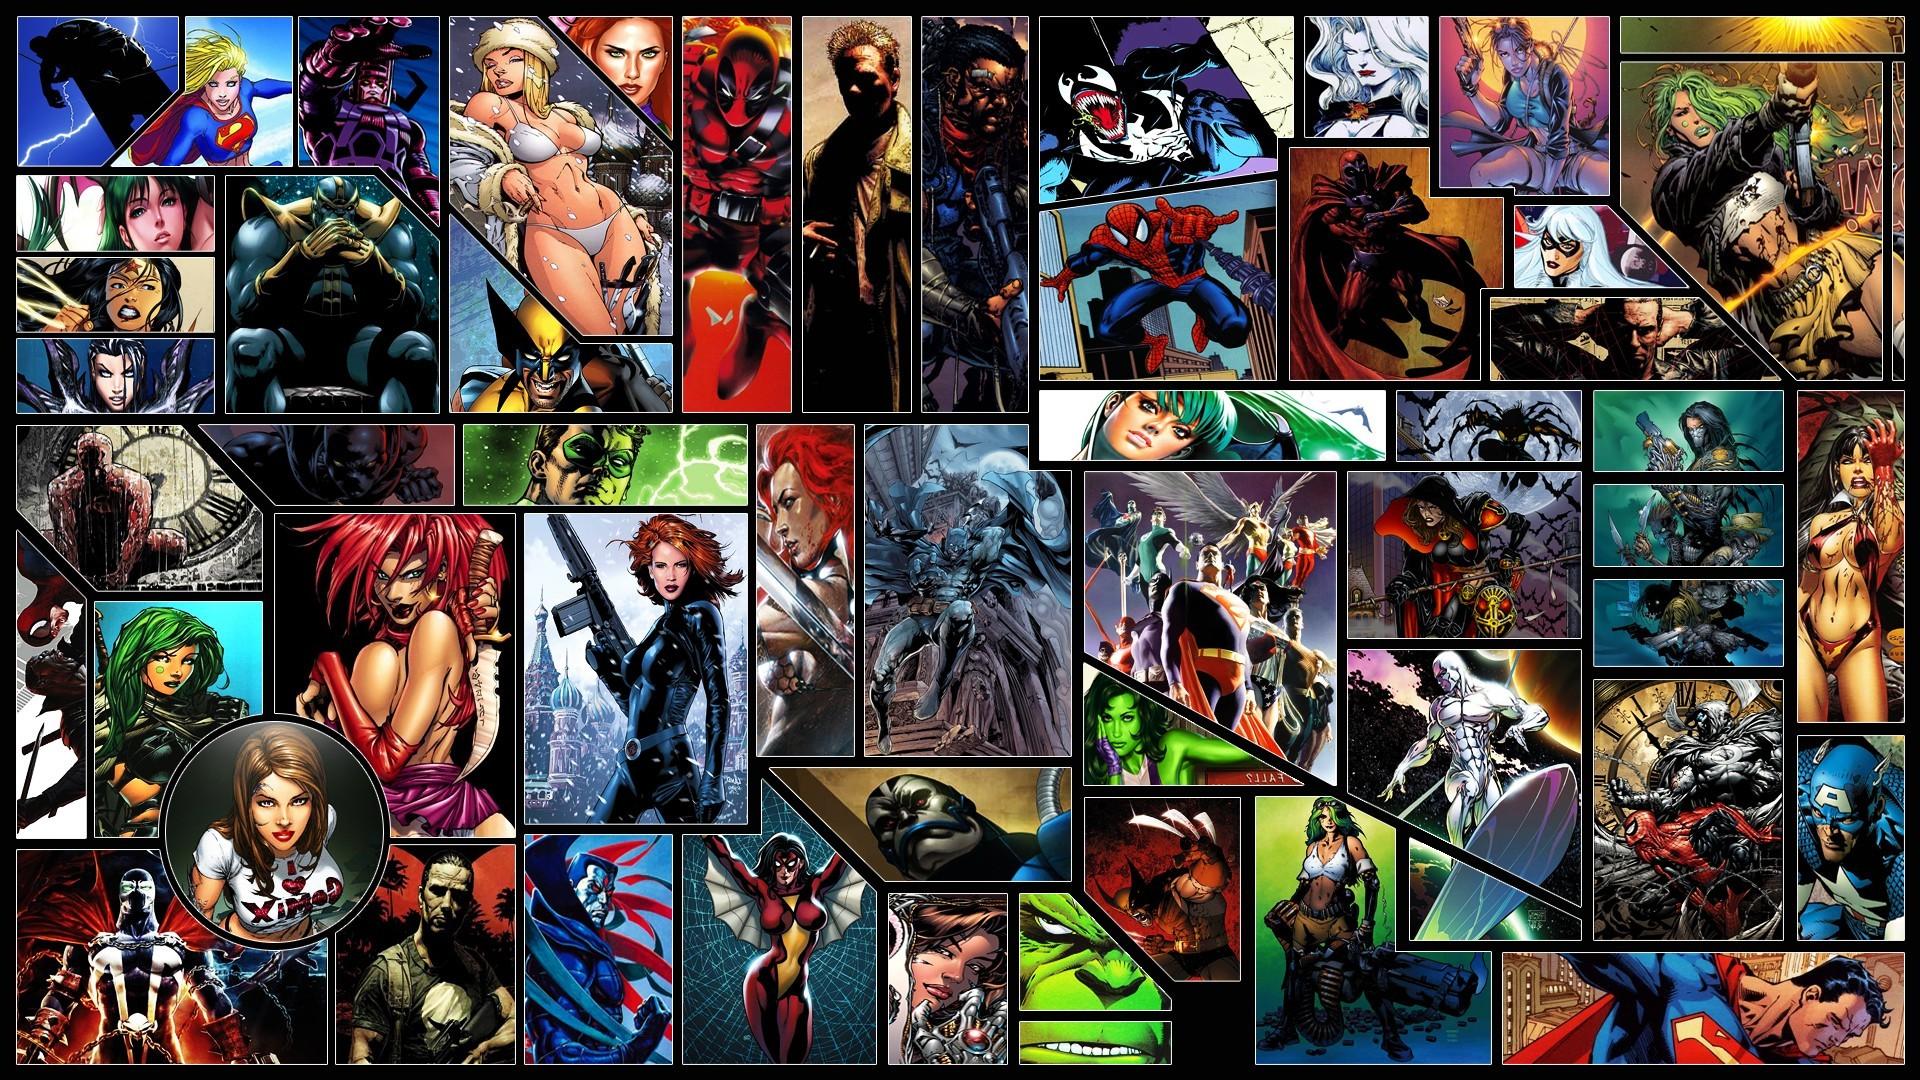 Black Widow, Spider Man, Deadpool, Silver Surfer, Hulk, Superman, Green  Lantern, Wolverine, Batman, Captain America, Supergirl, Wonder Woman, …